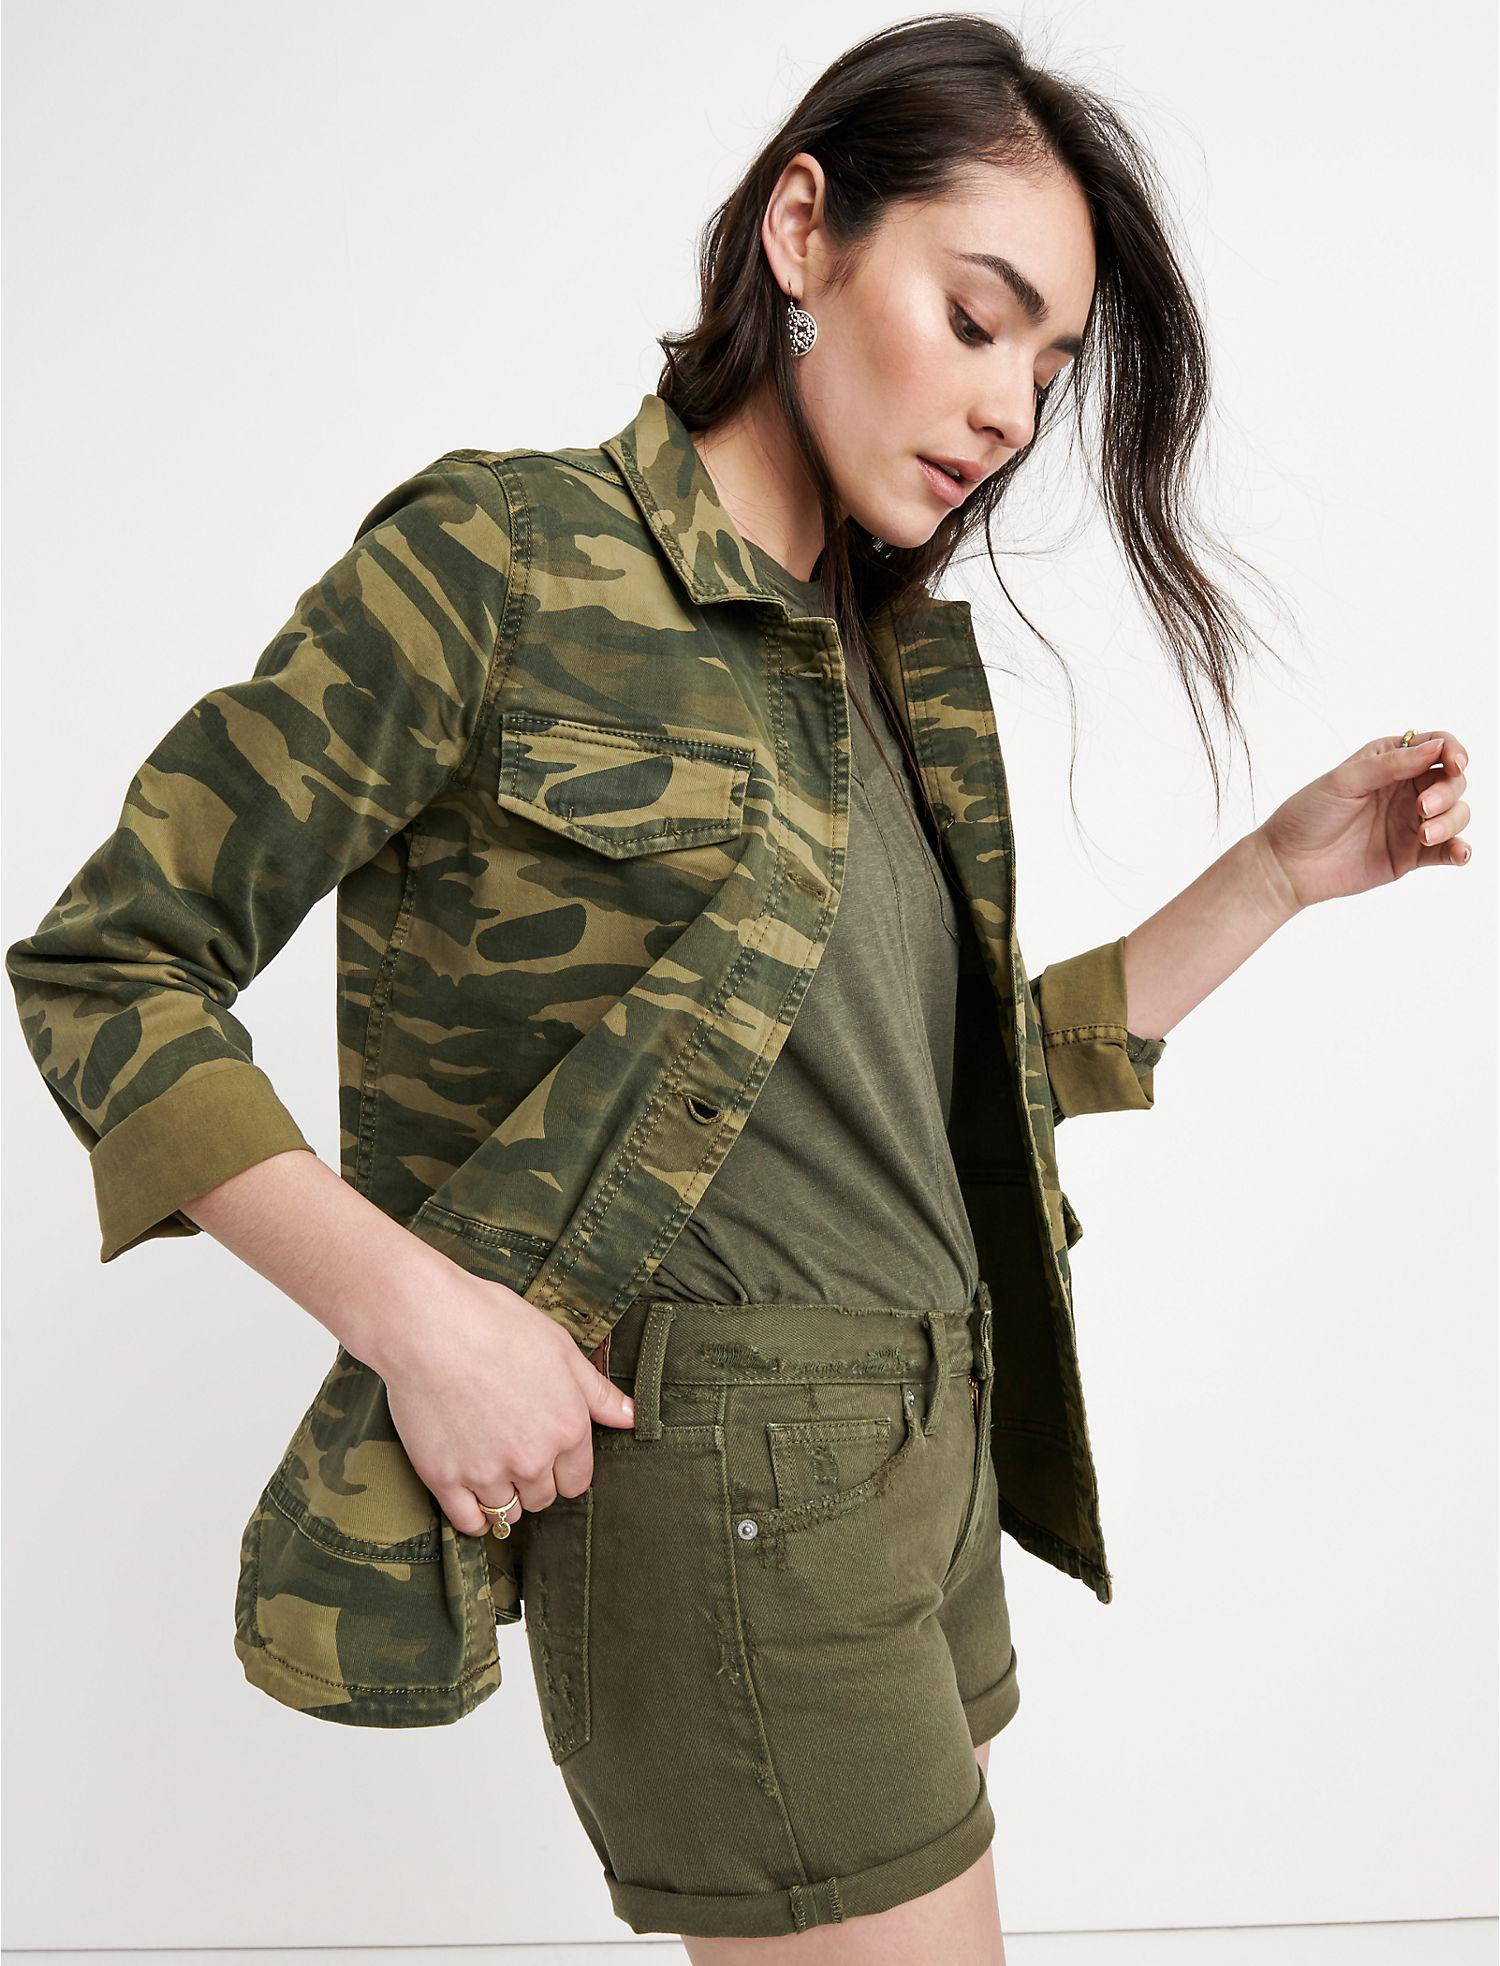 abe317bdb07 Lyst - Lucky Brand Shrunken Utility Camo Jacket in Green